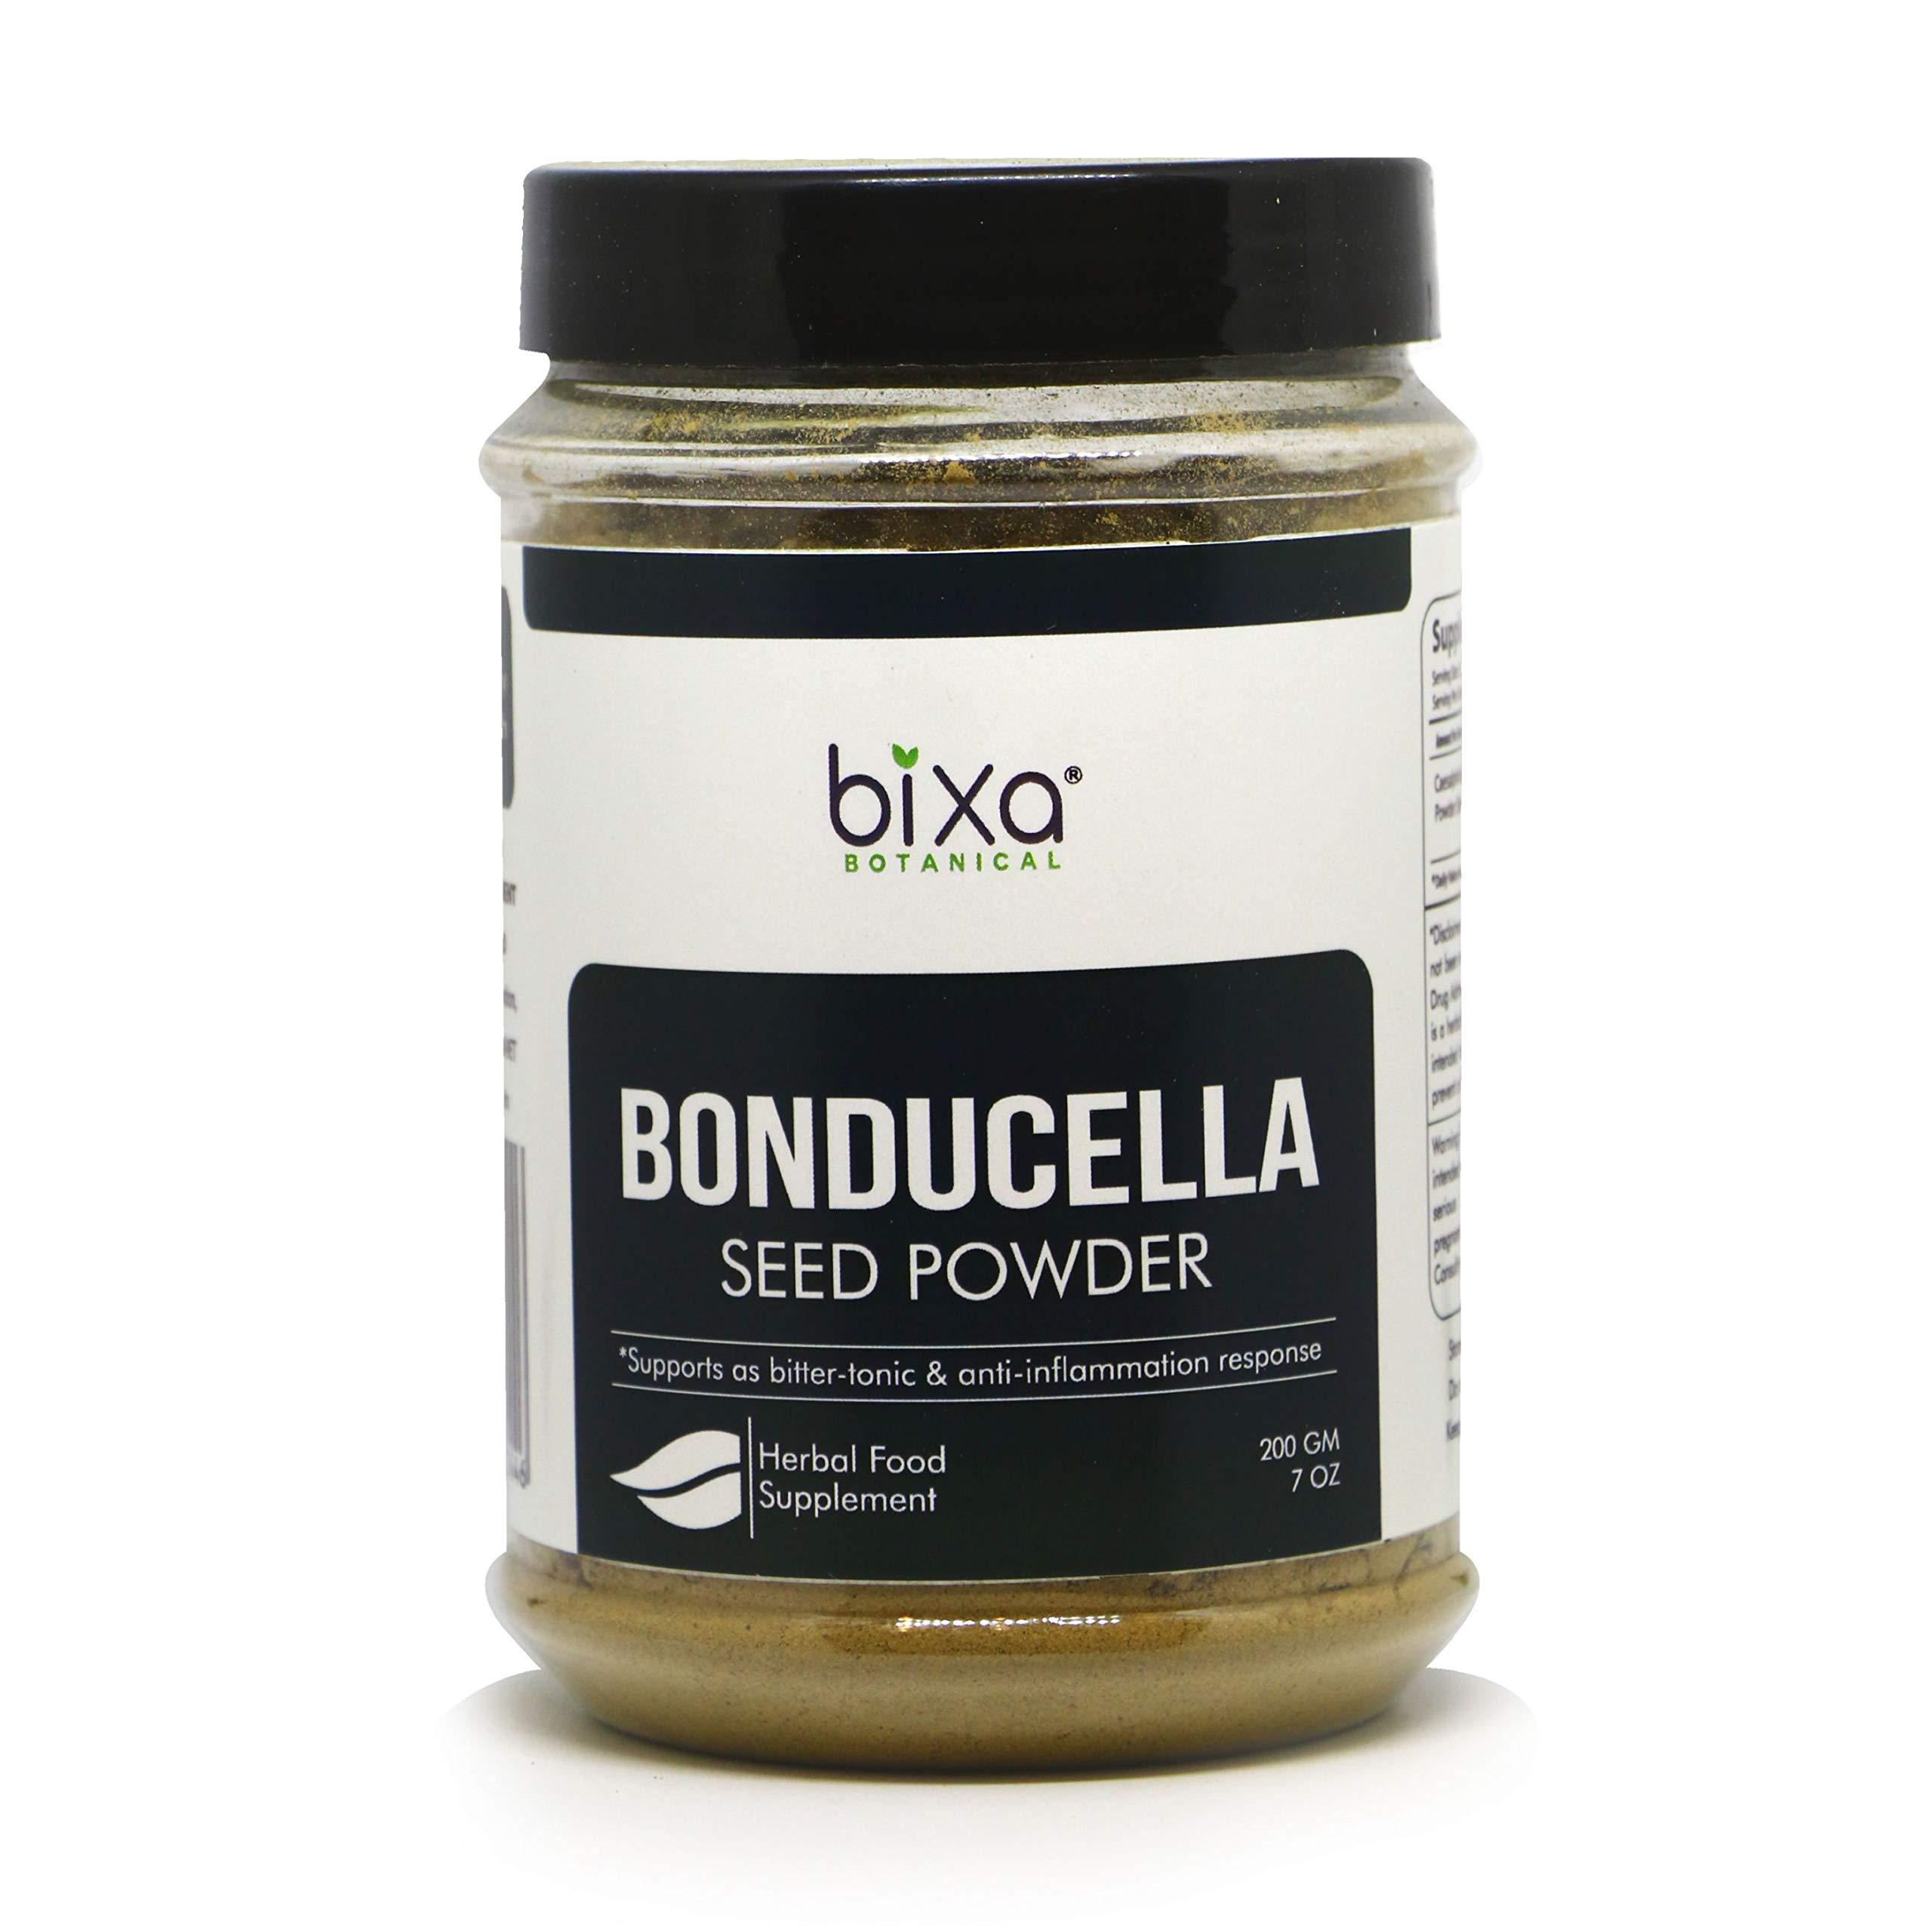 Bonducella Seed Powder (Sagargota/Caesalpinia Bonduc), Supports as Bitter-Tonic & antiinflammation Response by Bixa Botanical - 7 Oz (200g)